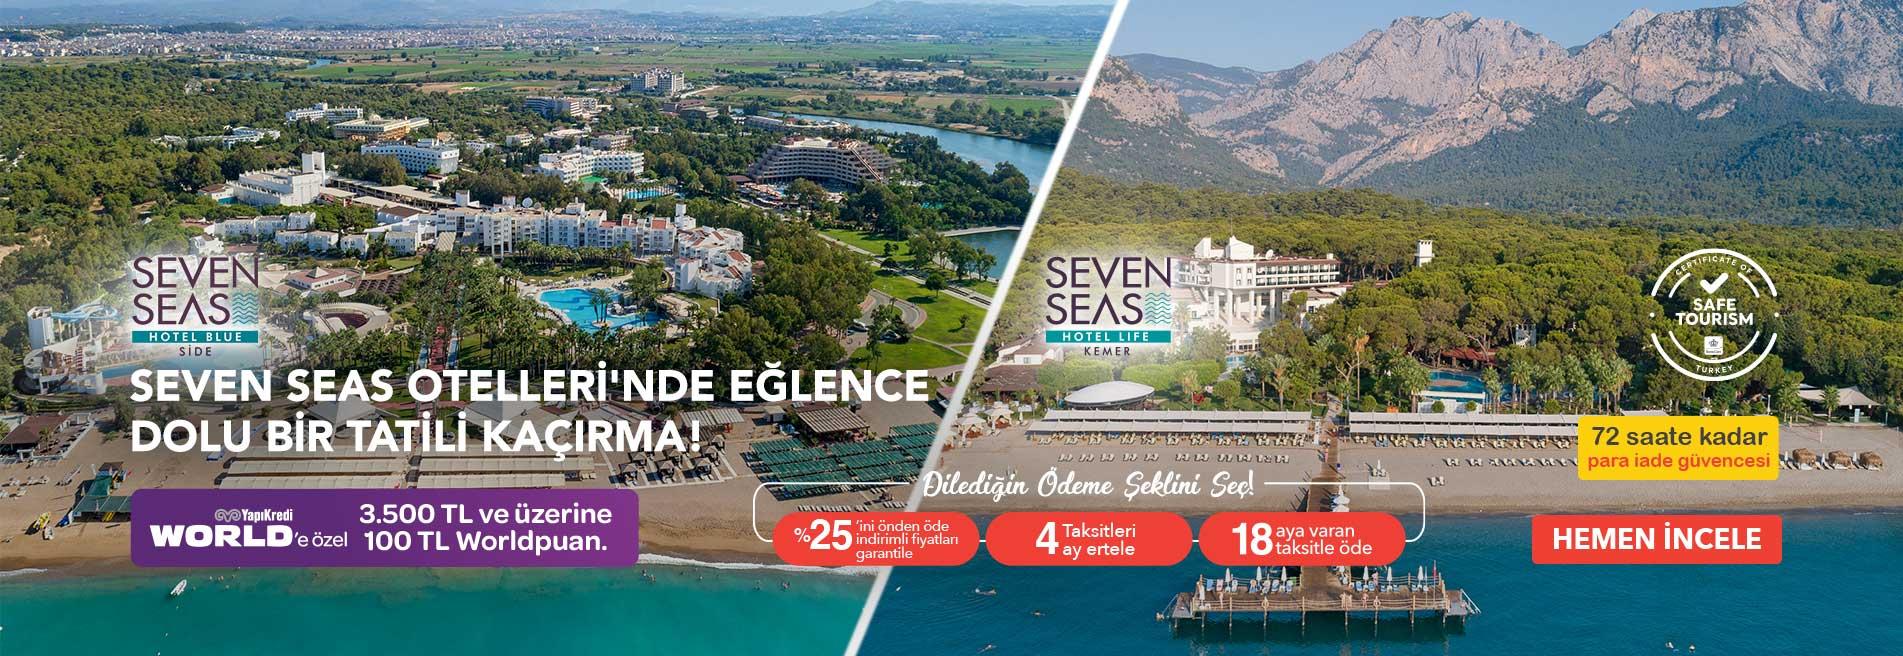 Seven Seas Hotels